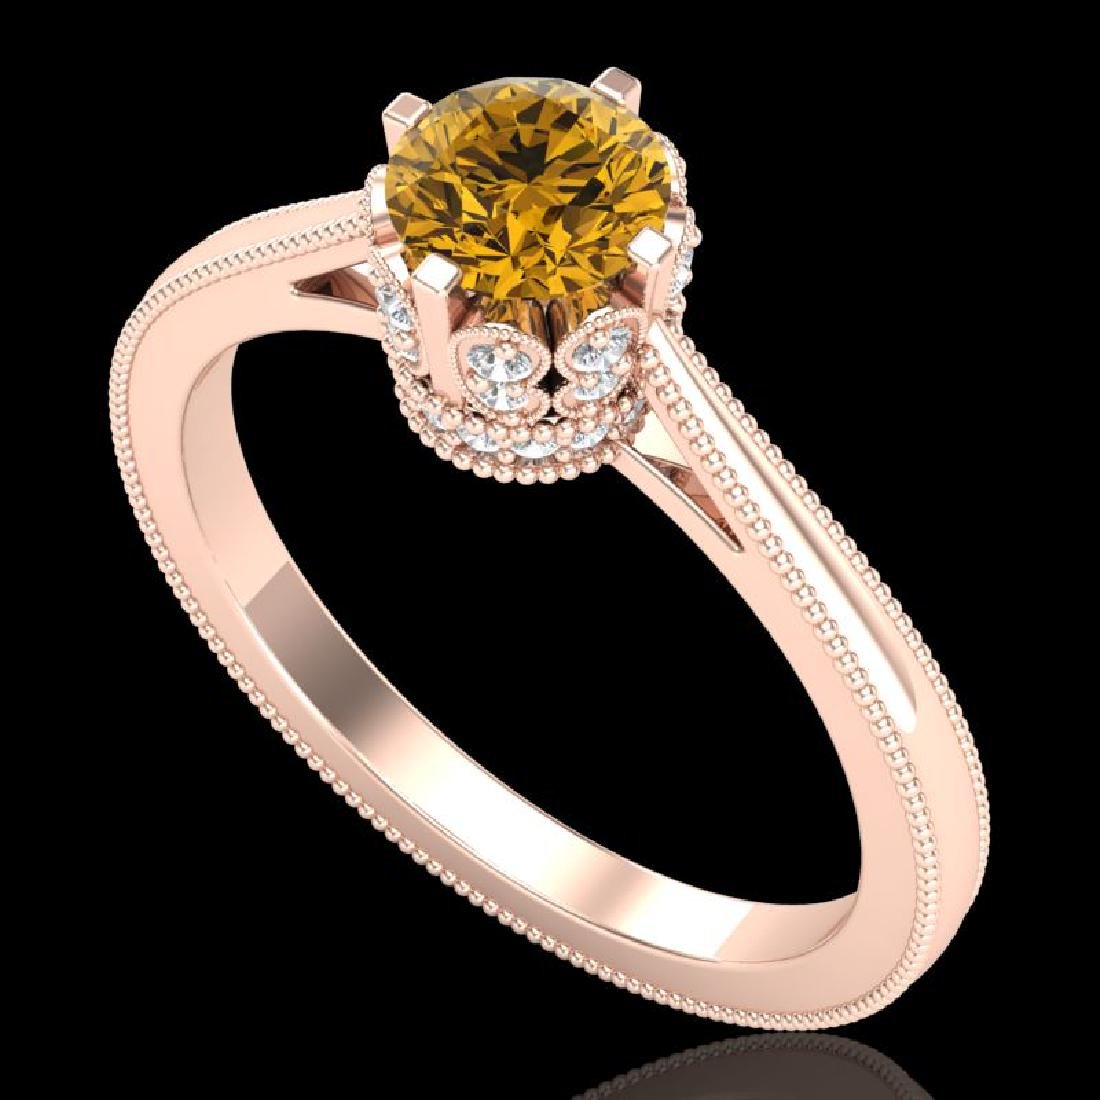 0.81 CTW Intense Fancy Yellow Diamond Engagement Art